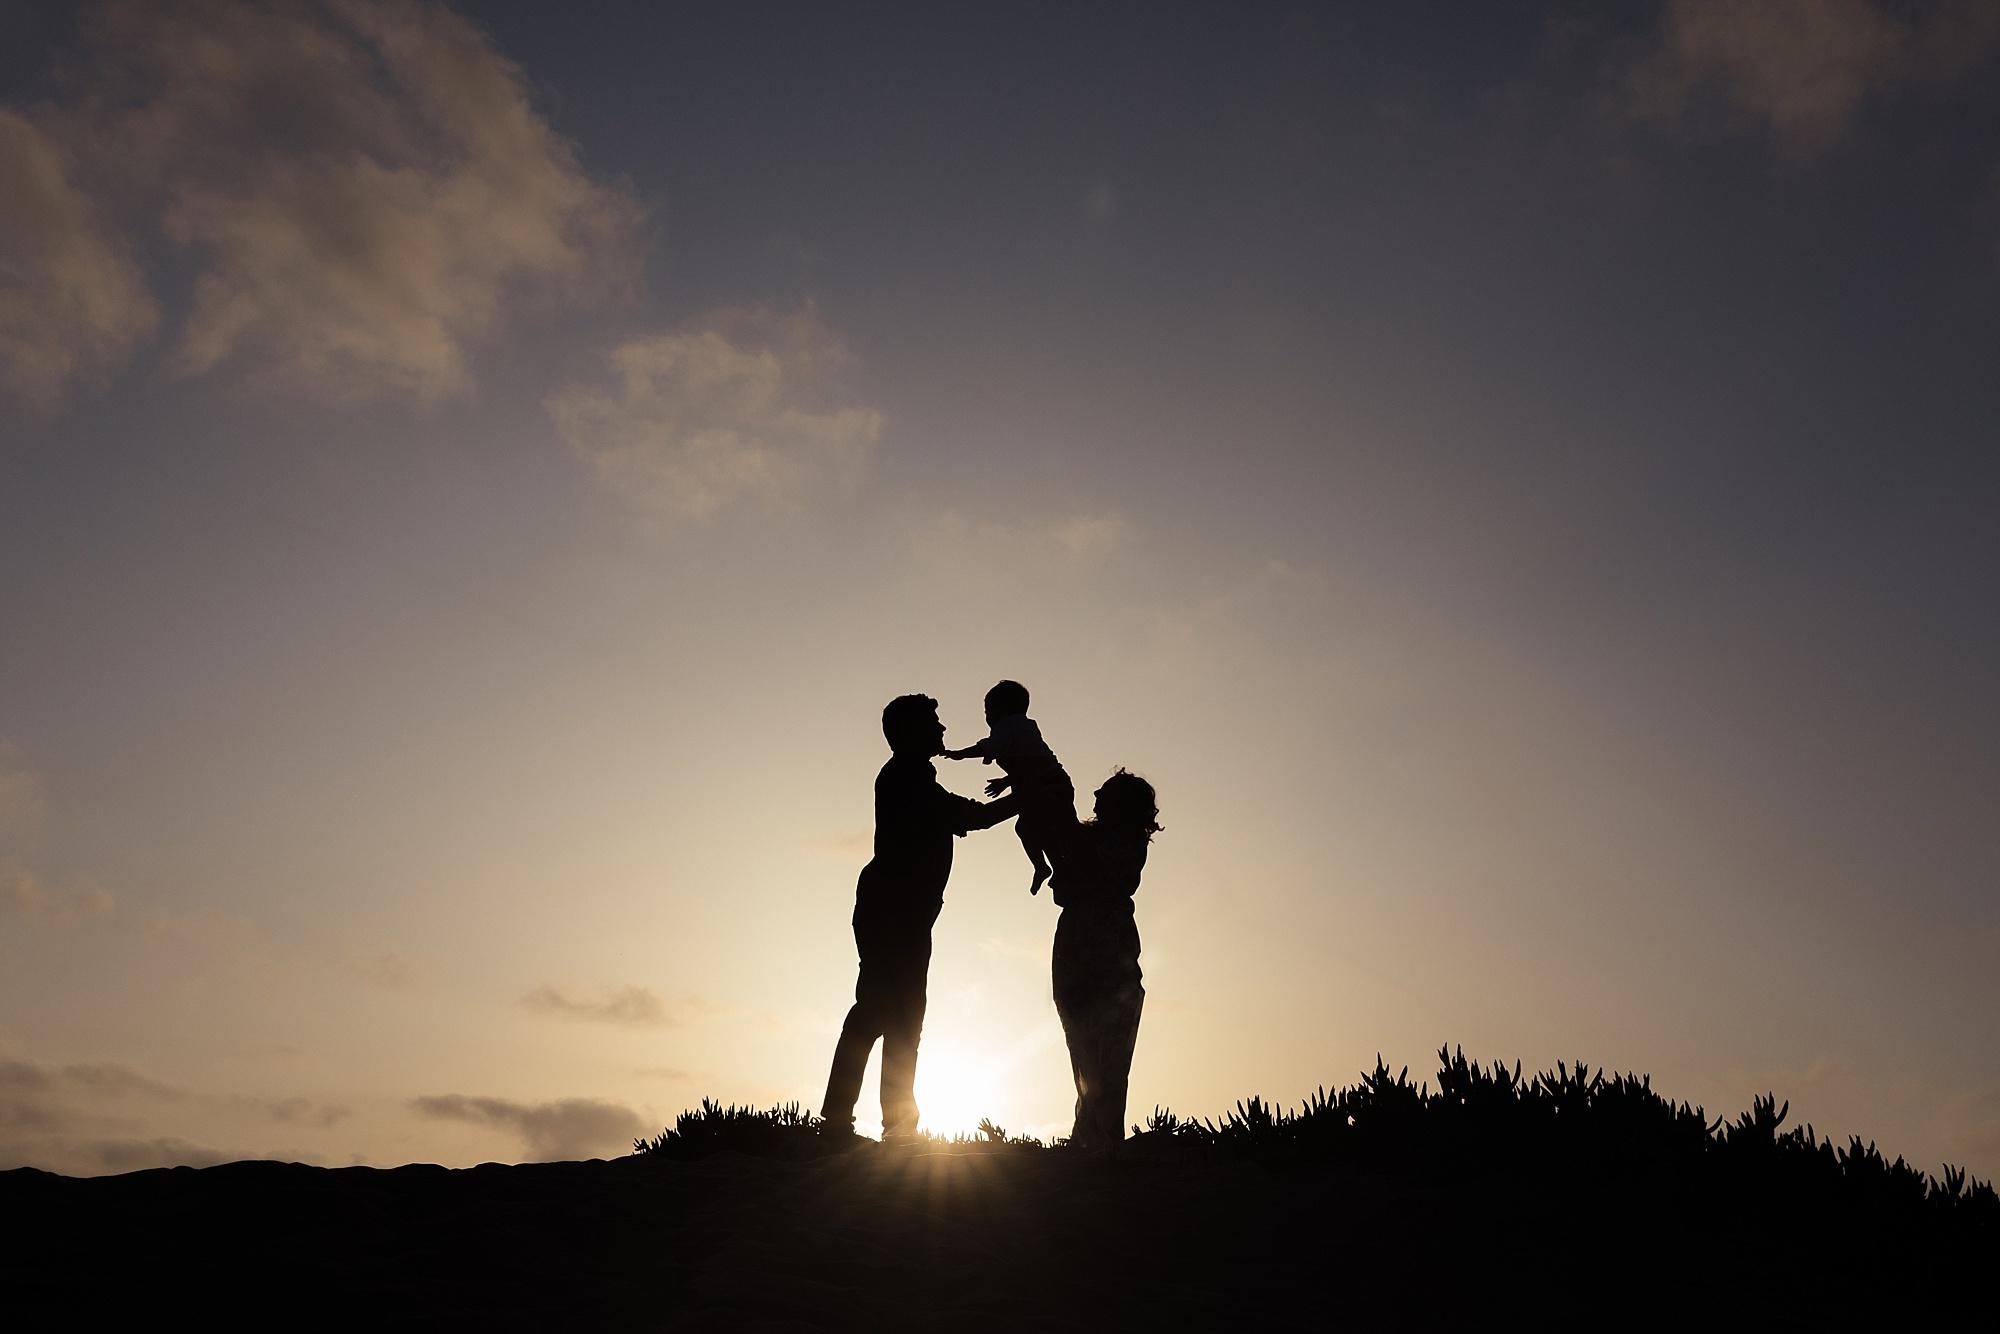 San Diego Photographer | Silhouette